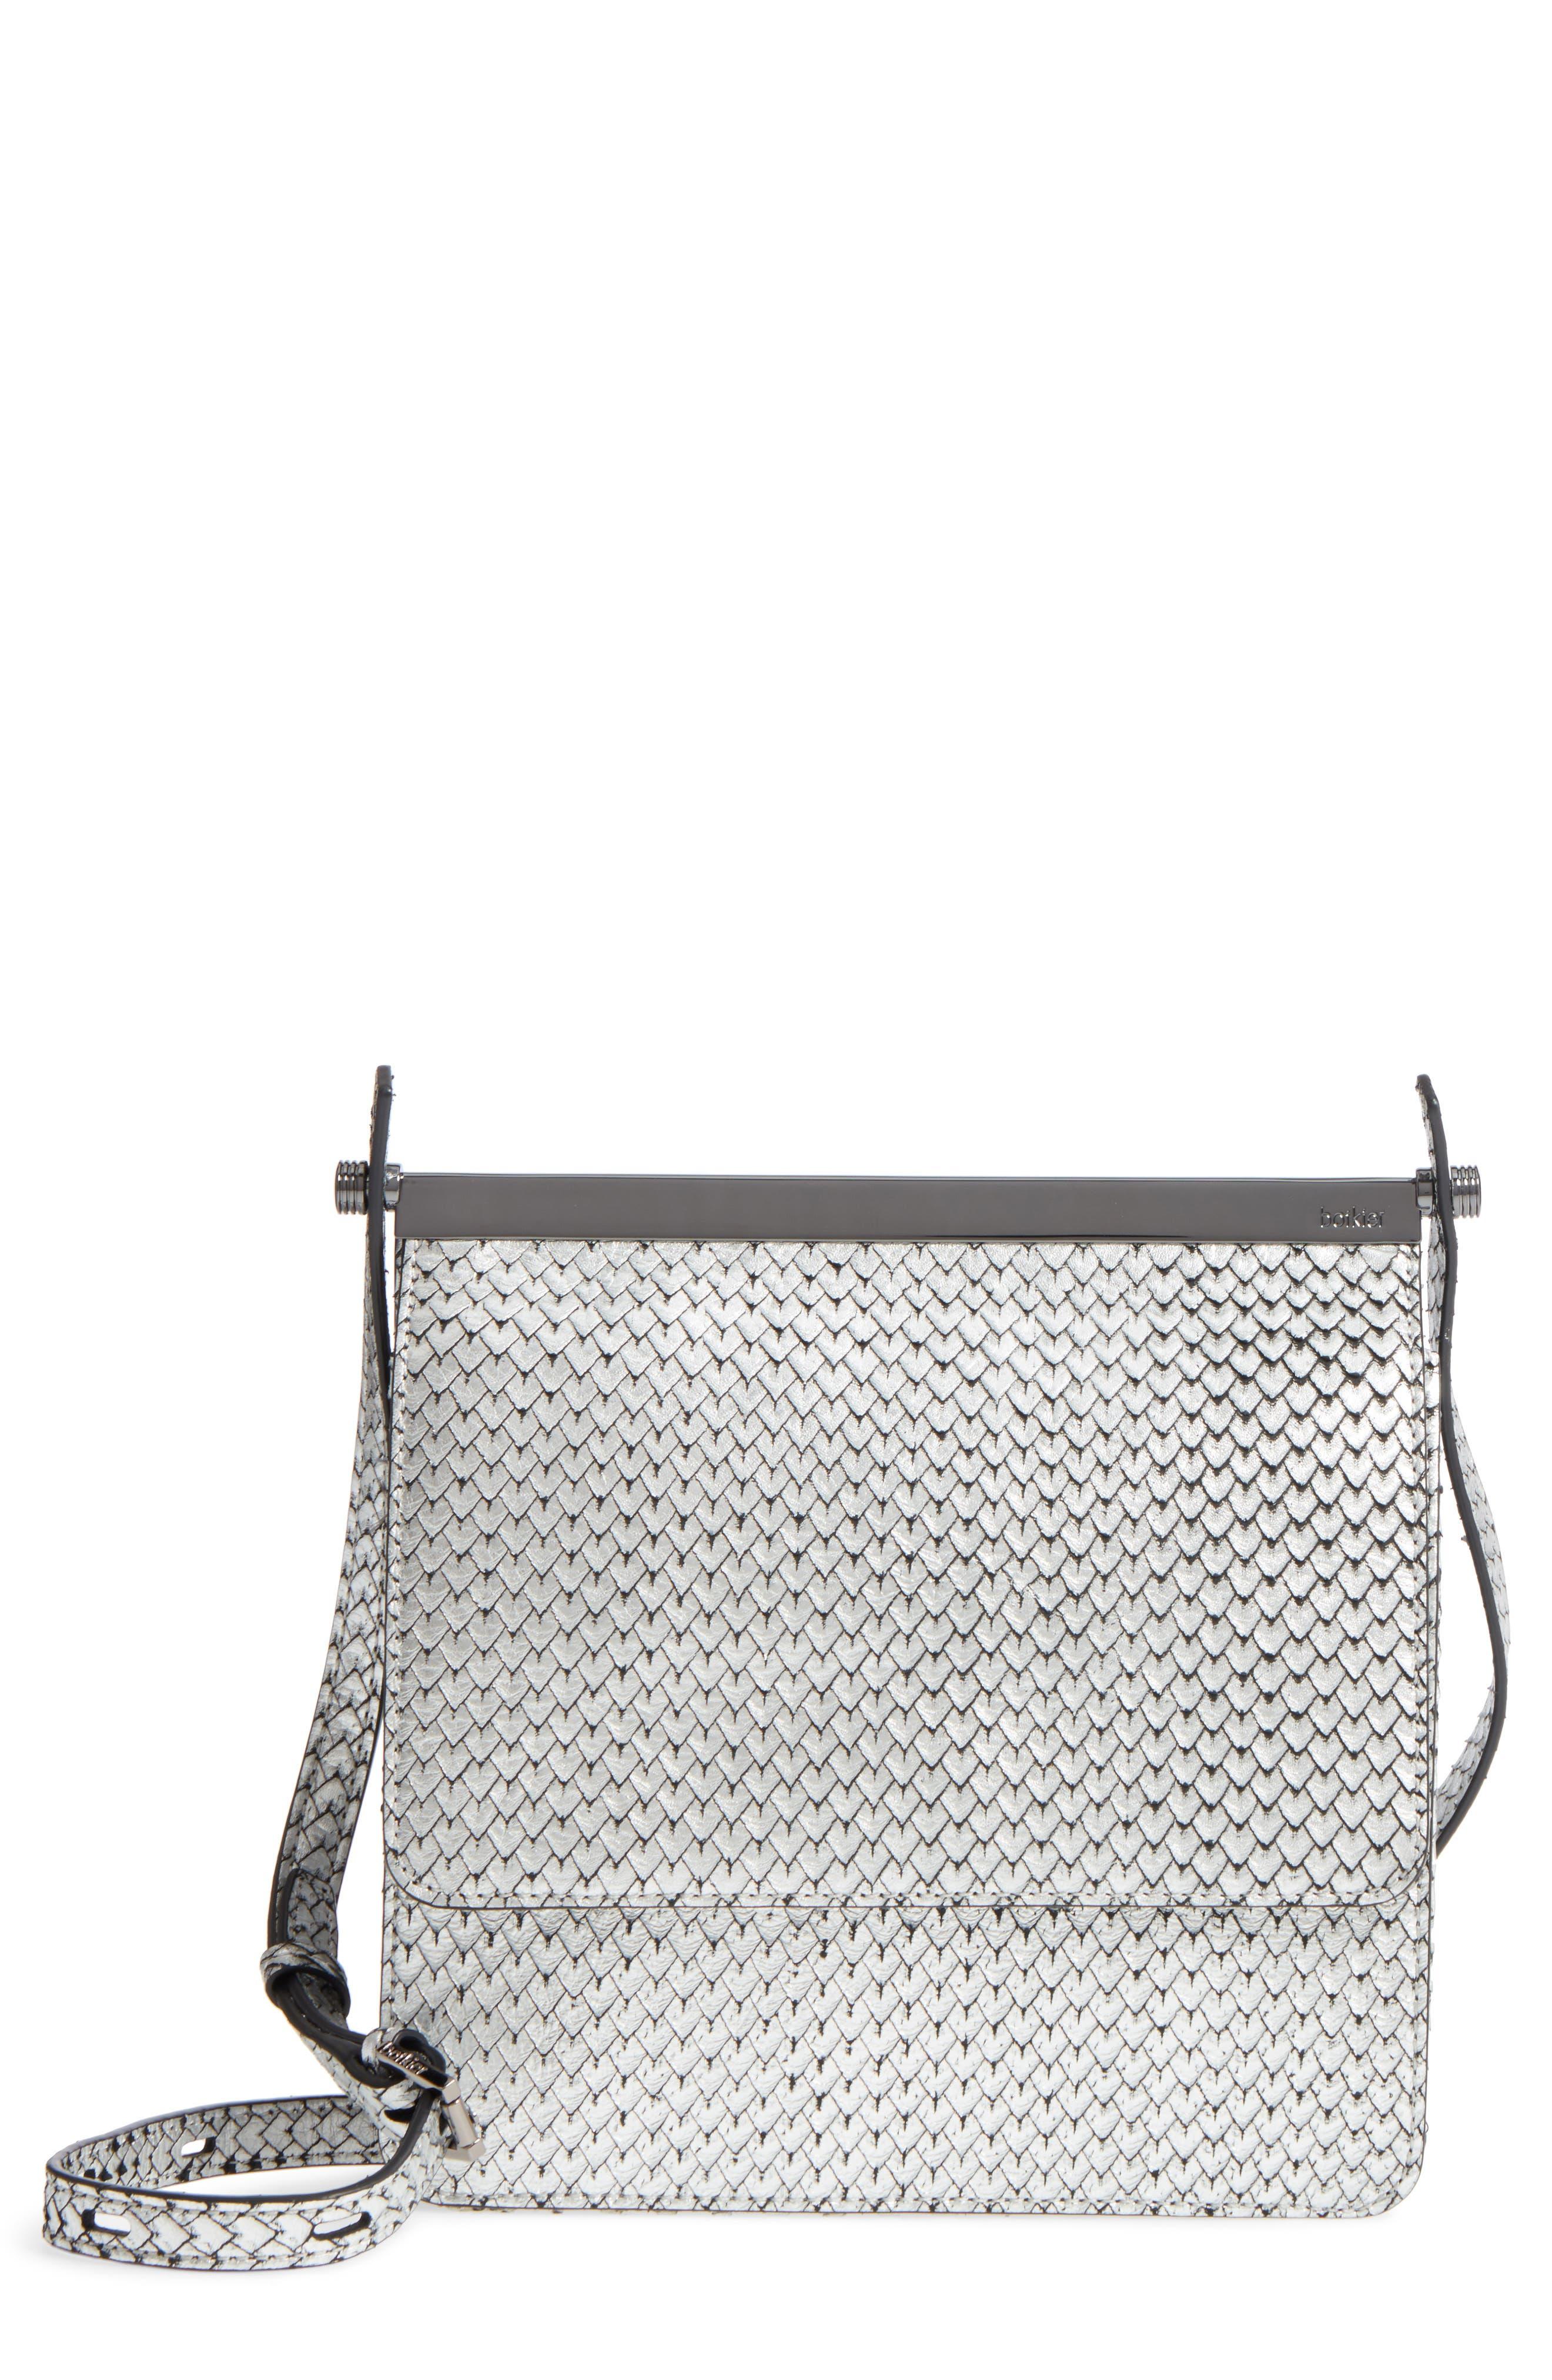 Crawford Calfskin Leather Crossbody Bag,                             Main thumbnail 2, color,